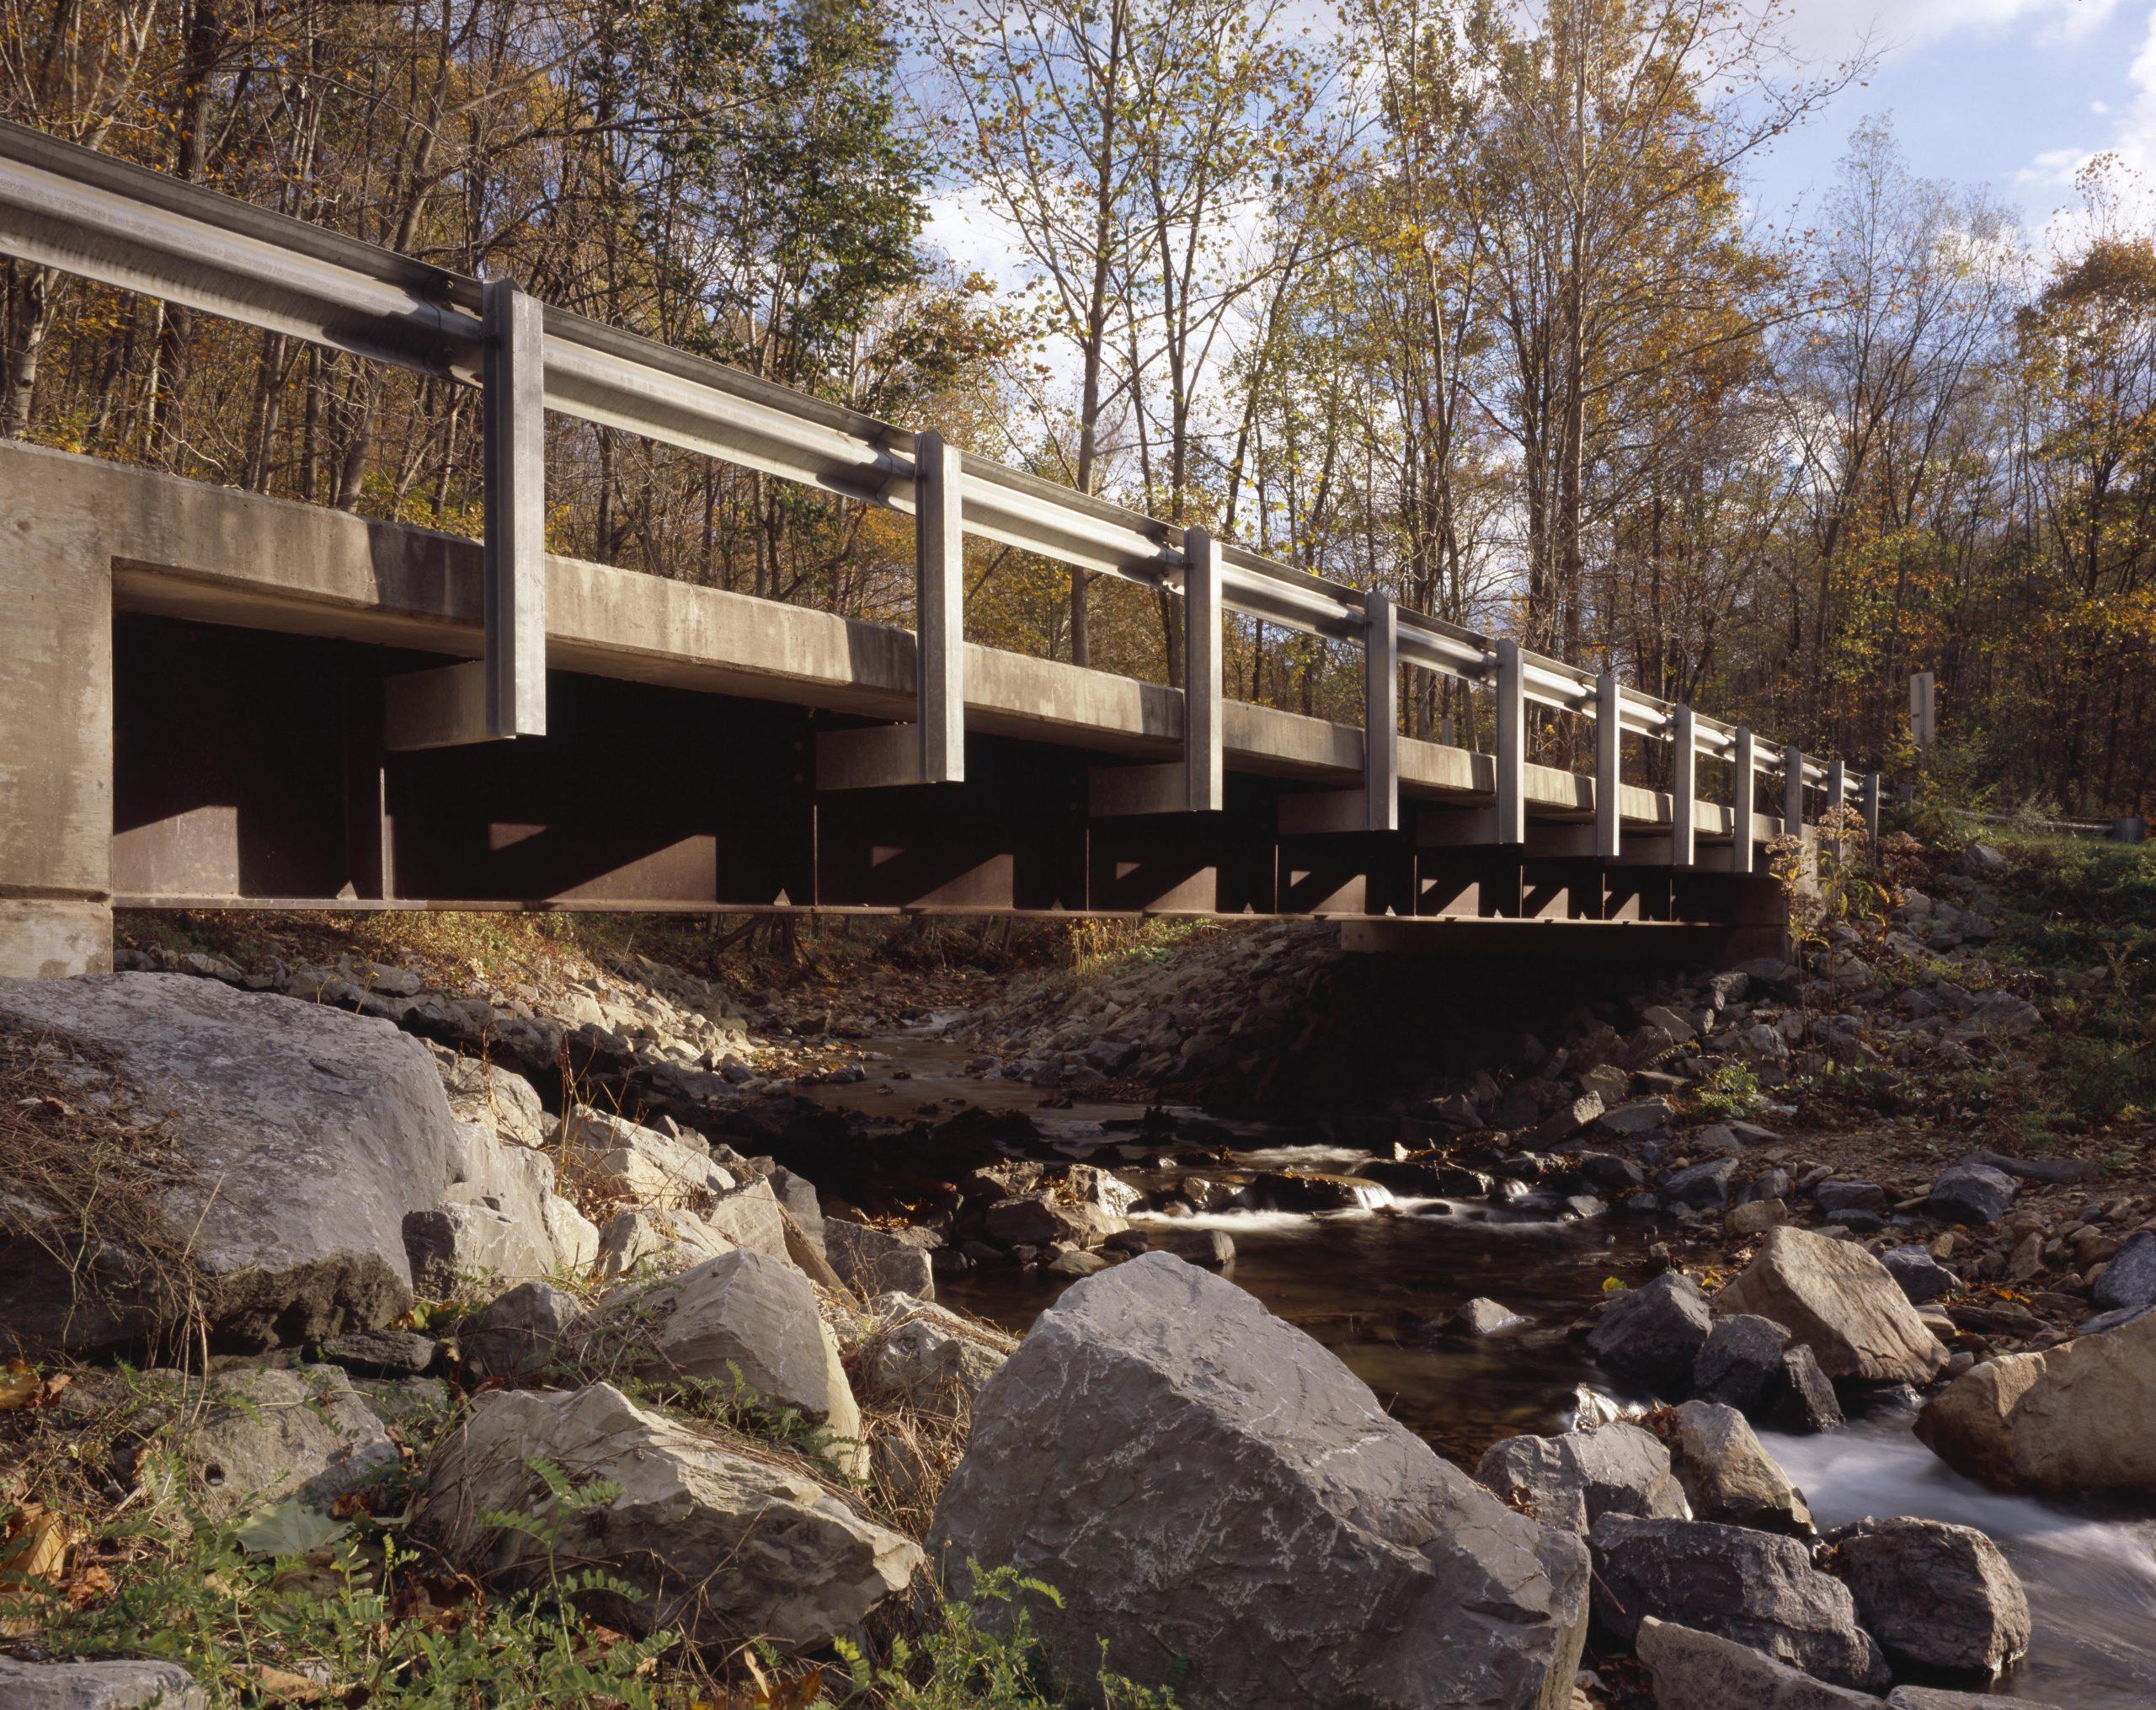 Weathering Steel Bridge